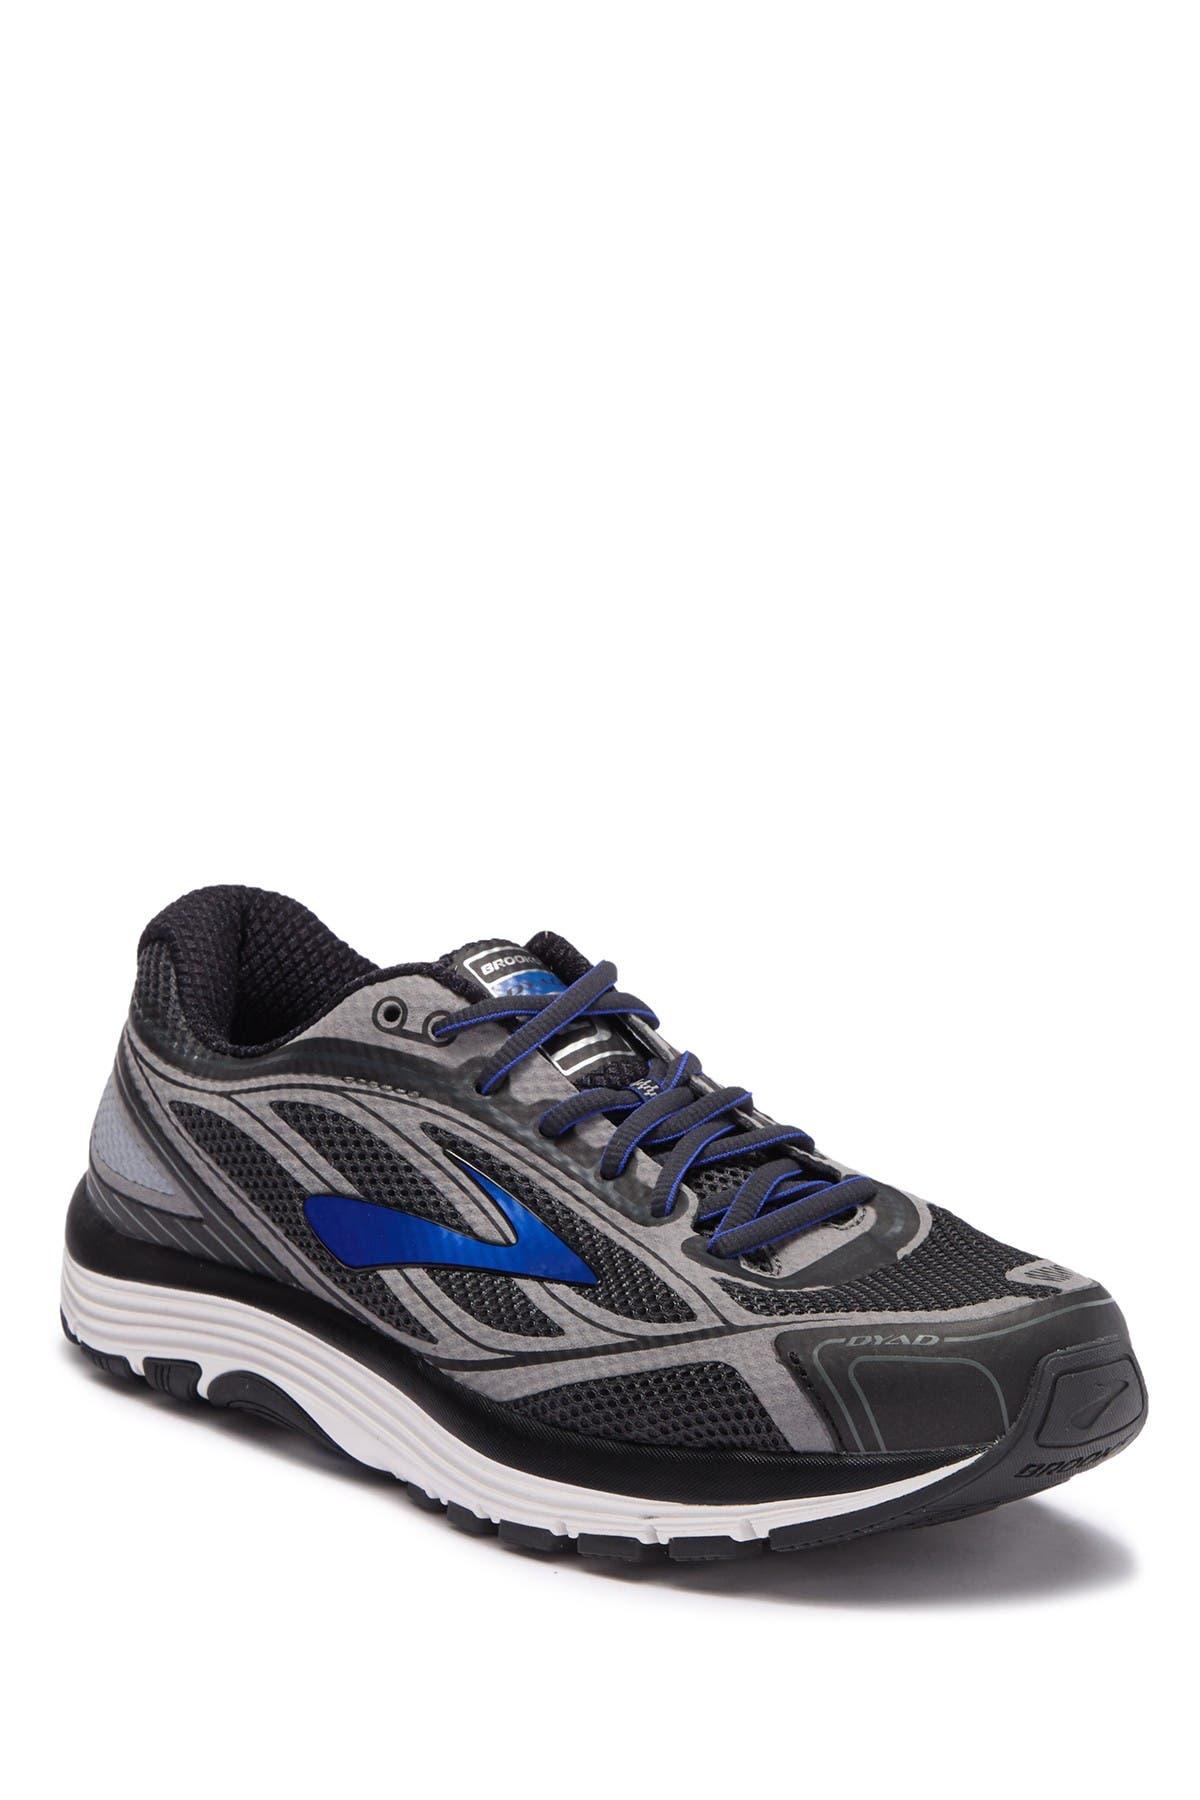 Brooks | Dyad 9 Trail Running Shoe